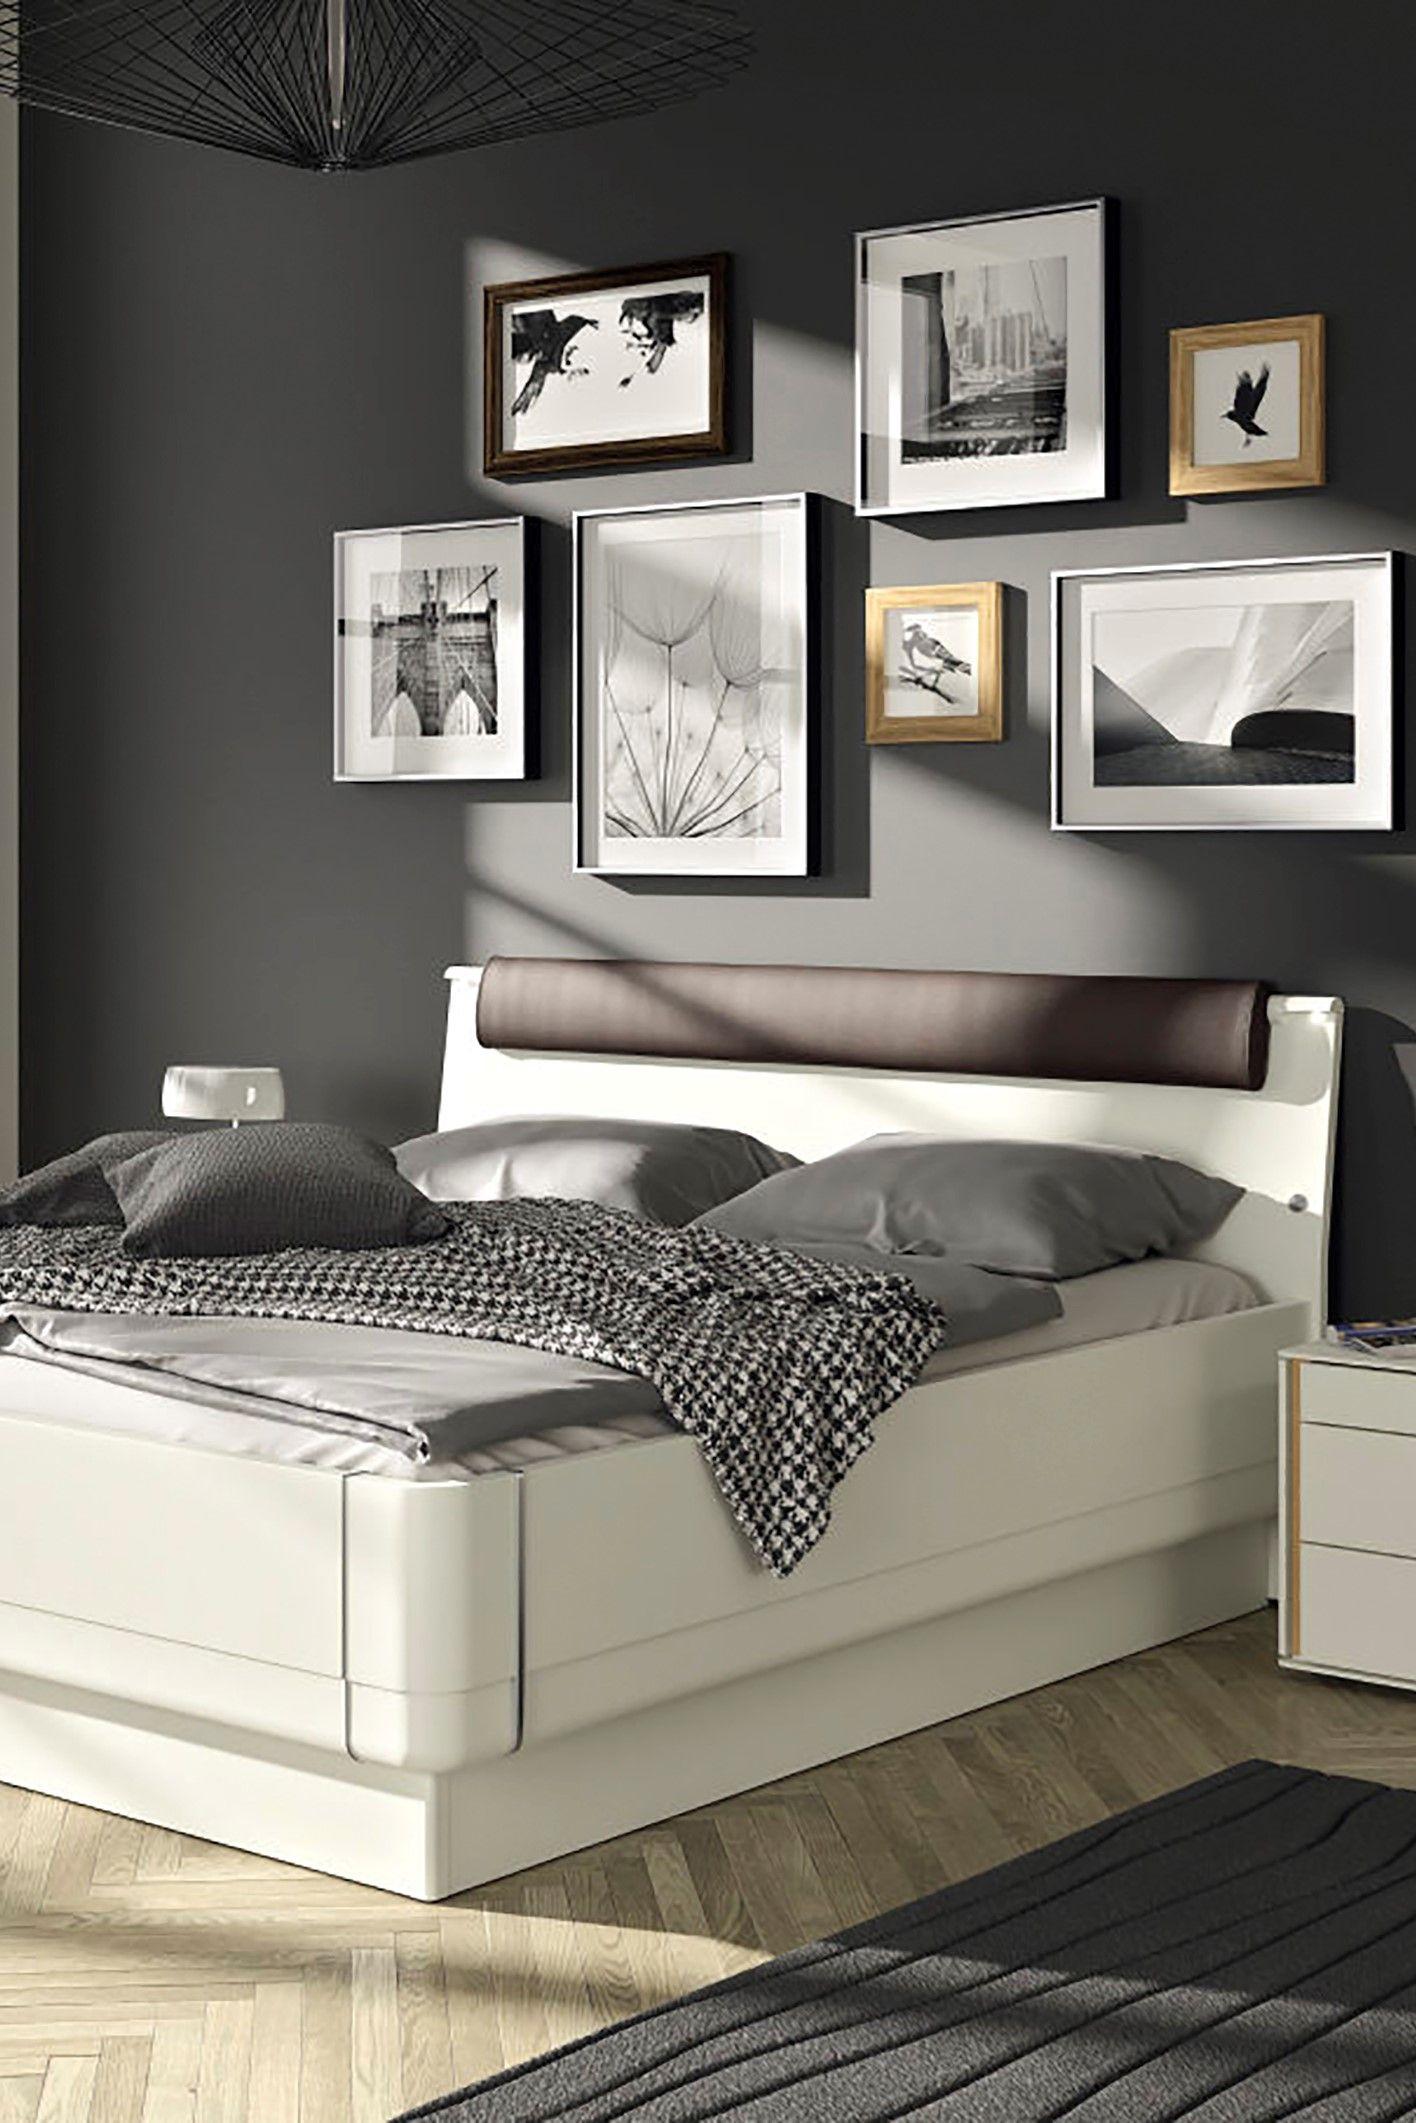 Bett Multi Bed 180x200 Cm In 2020 Bett Ideen Hulsta Bett Haus Wohnzimmer